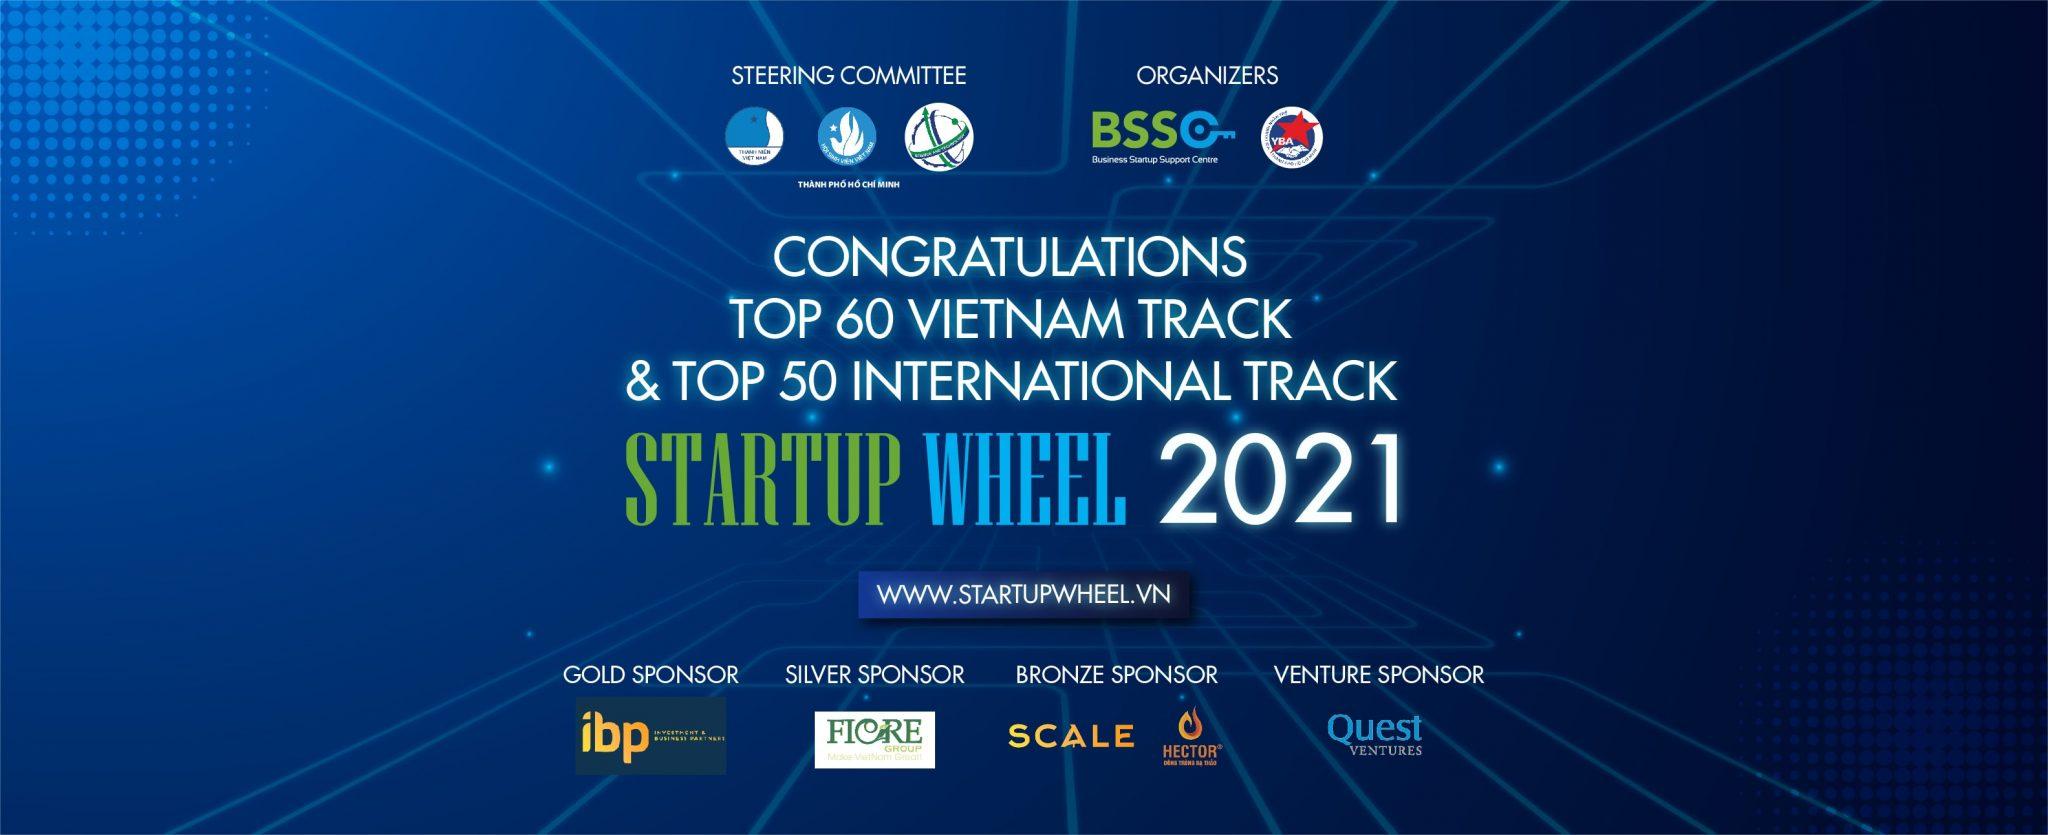 Top 60_Startup Wheel 2021